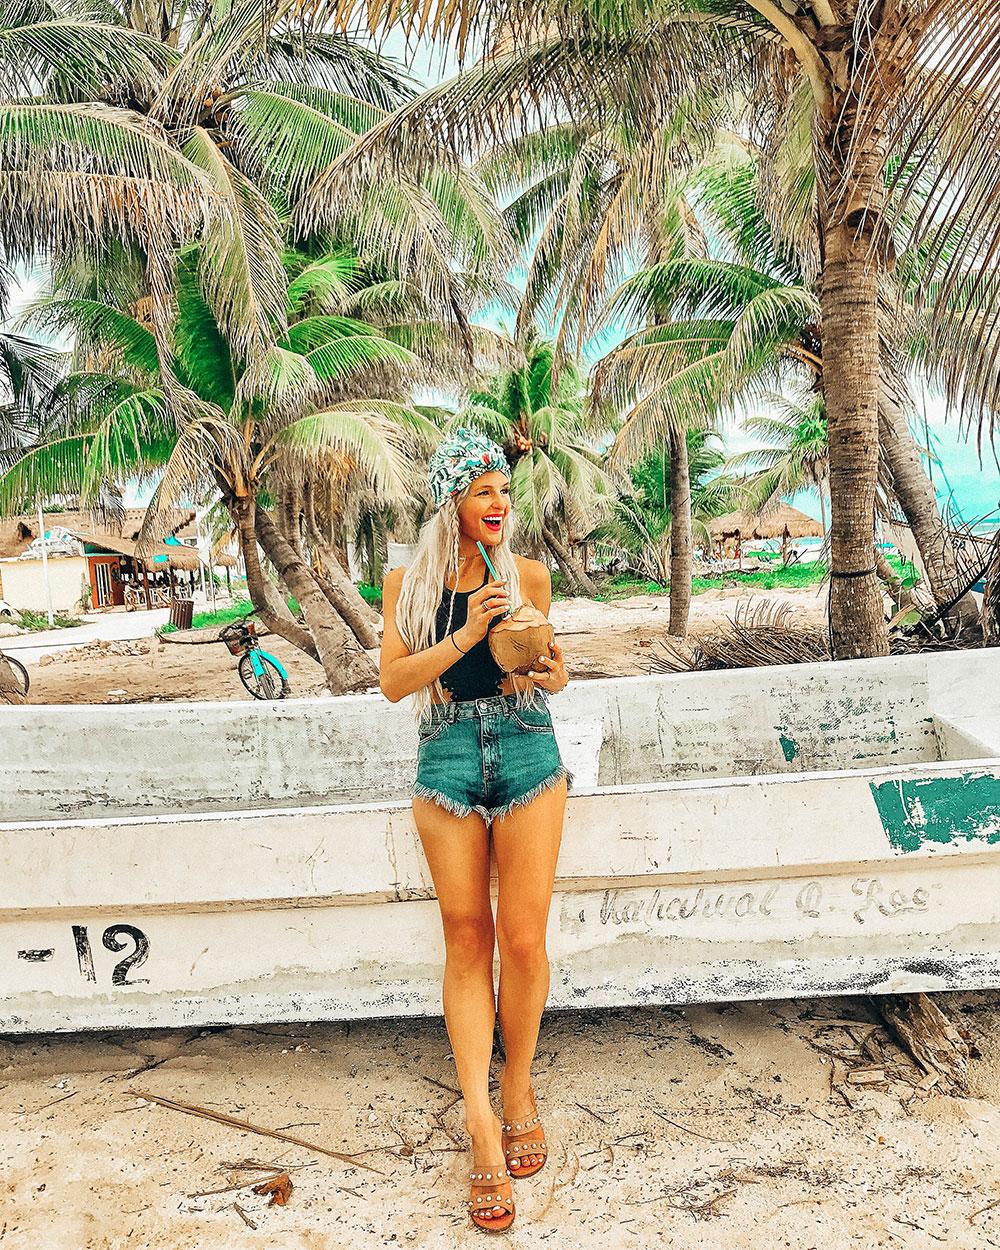 costa maya travel guide